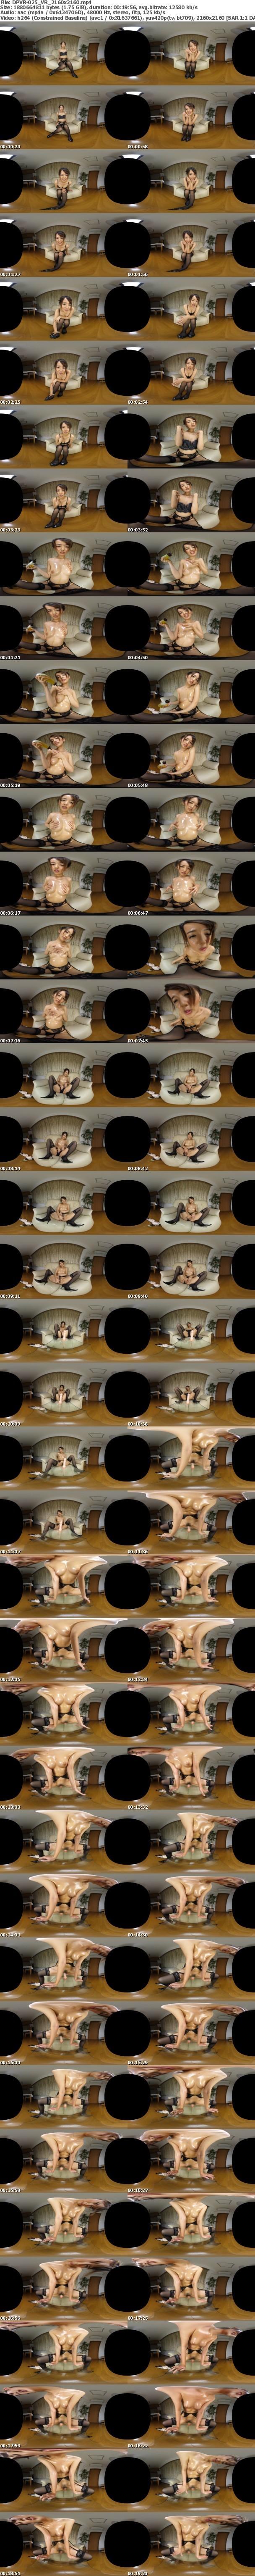 VR/3D DPVR-025 【VR】バイノーラル もしも美咲かんながオナニーの助太刀してくれたら…